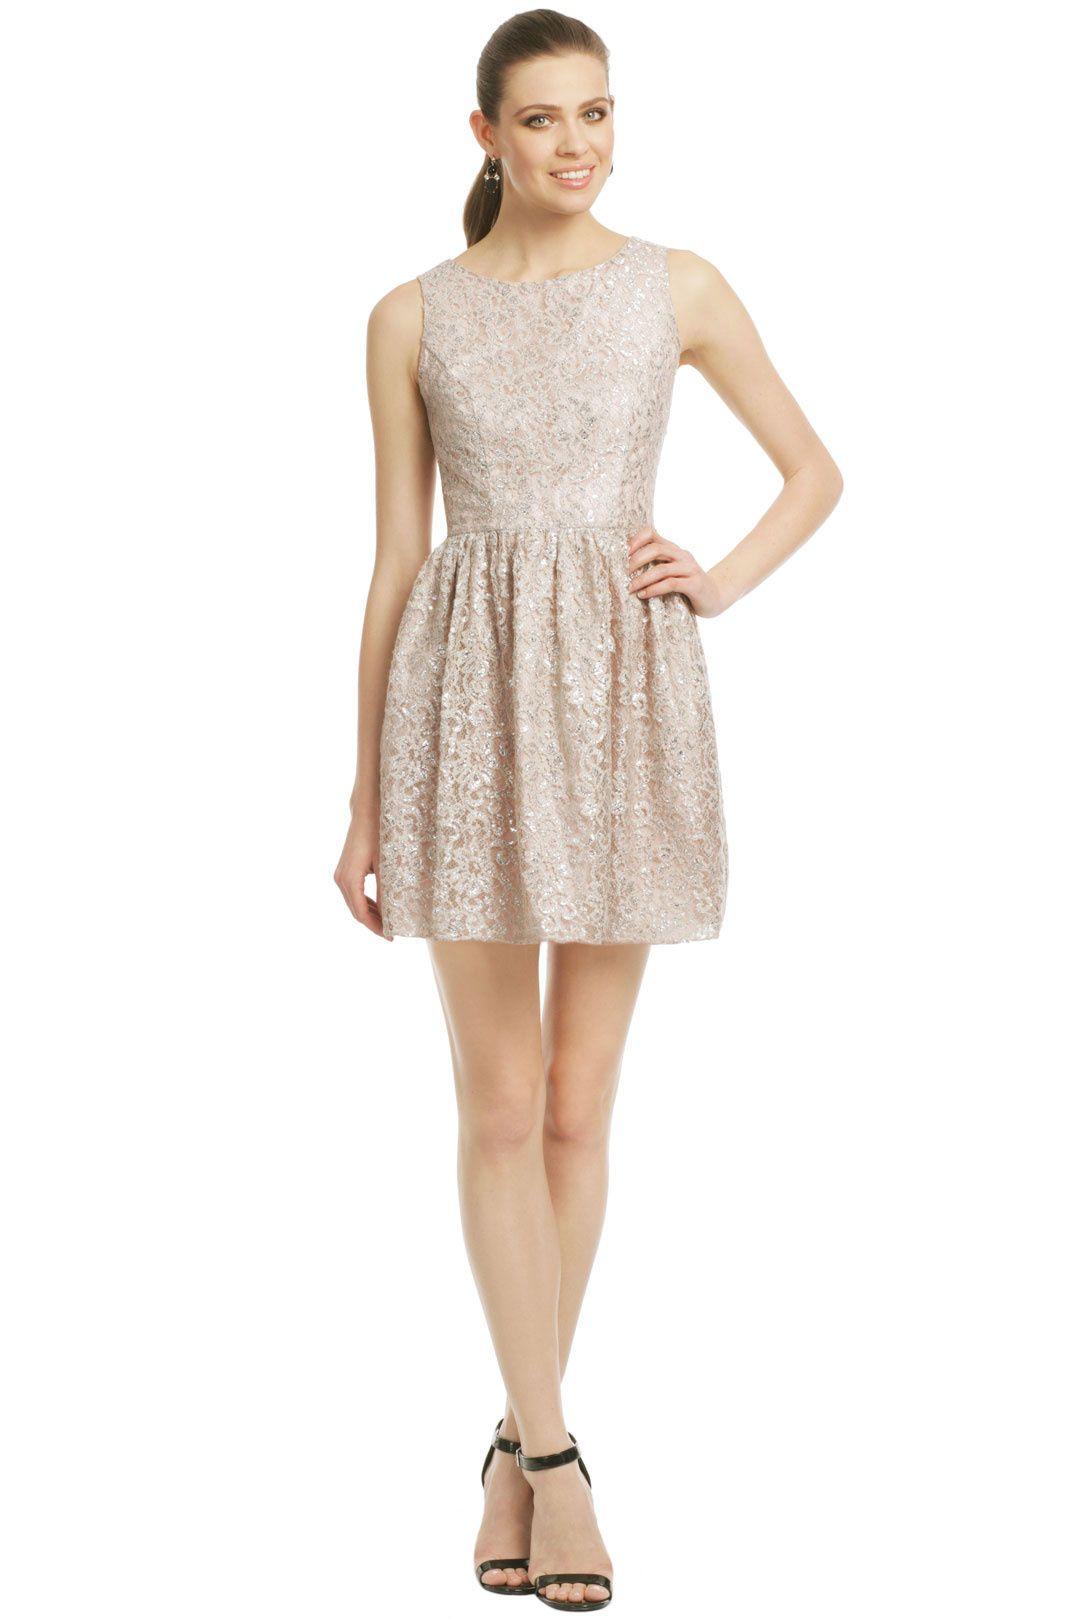 Rent your wedding dress  Blush Wedding Lace Dress  Pinterest  Blush weddings Lace dress